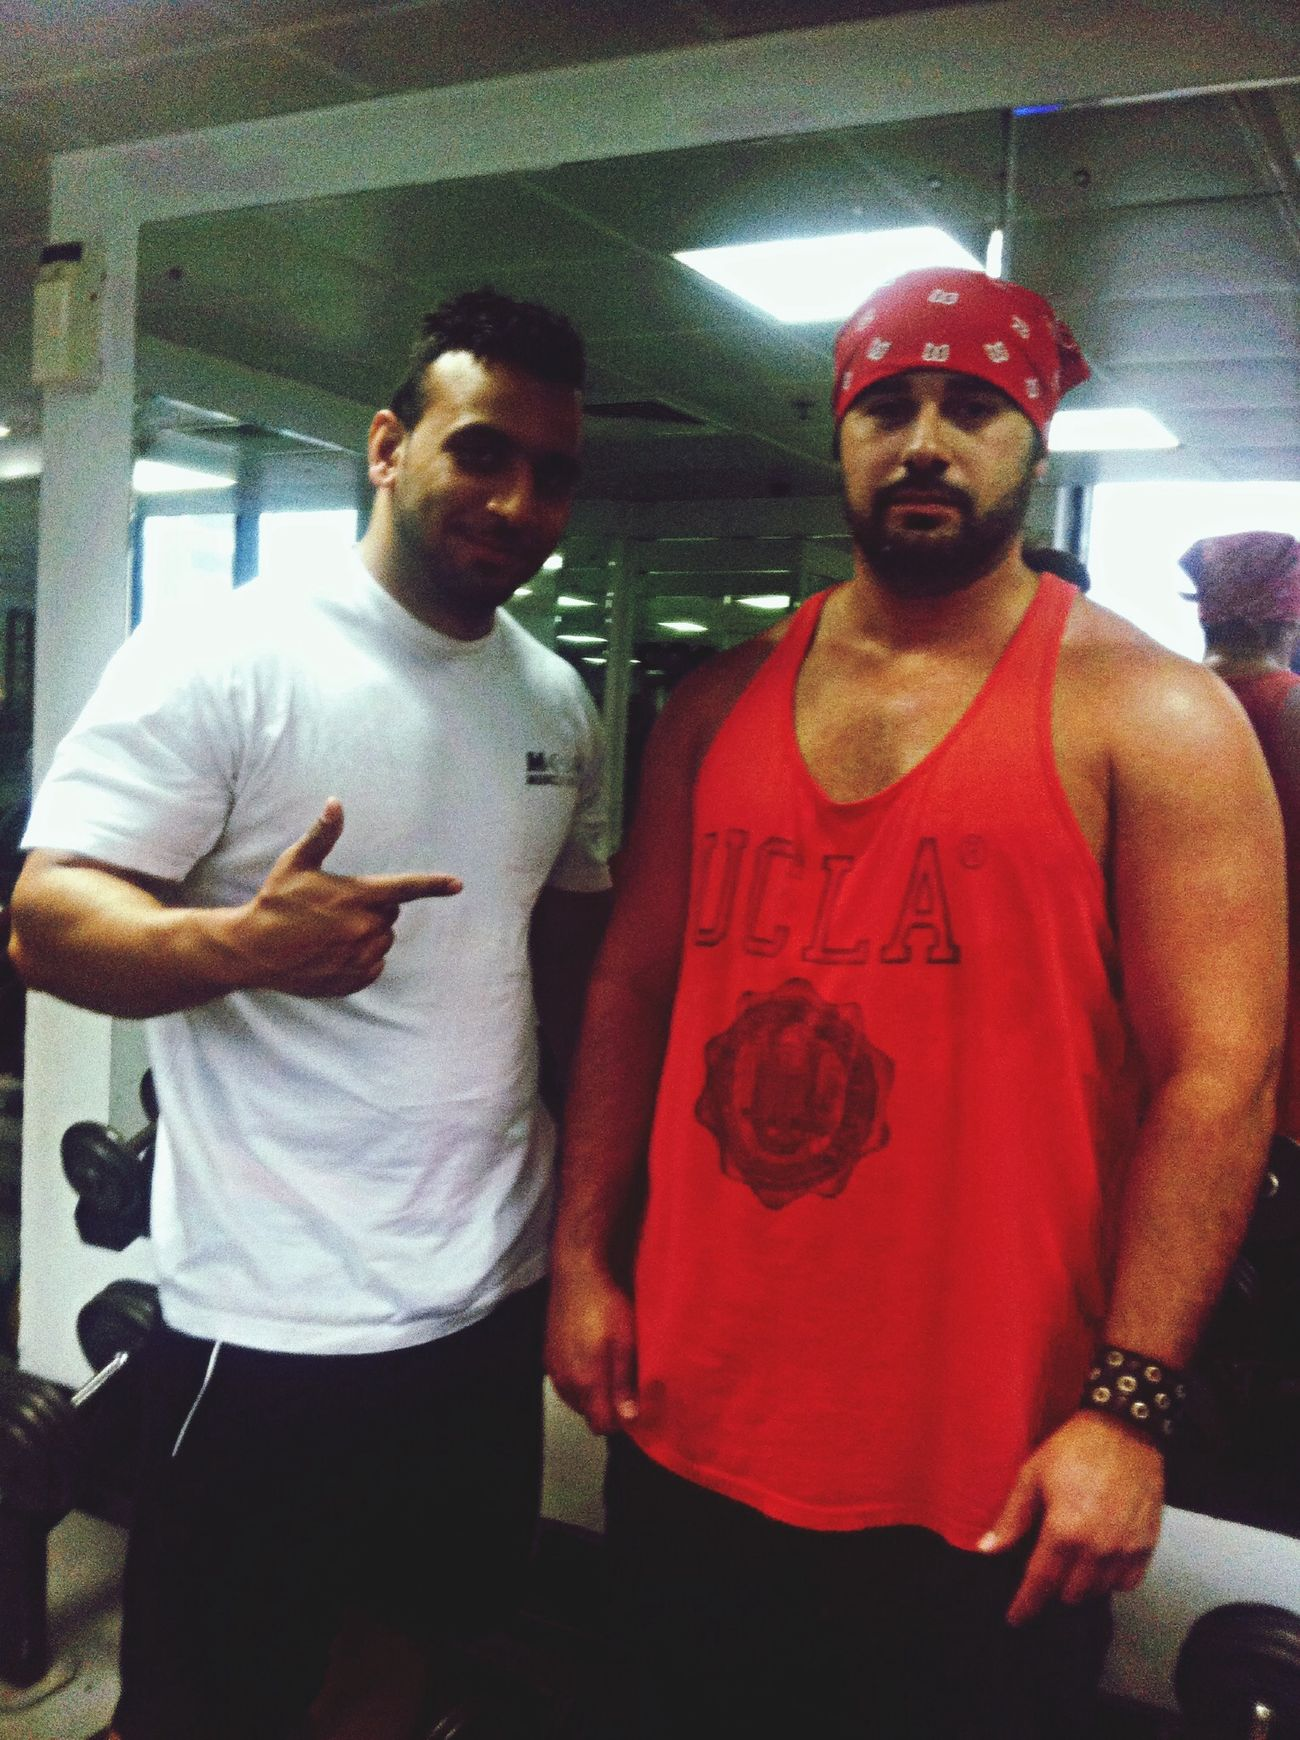 Me and capten khaled